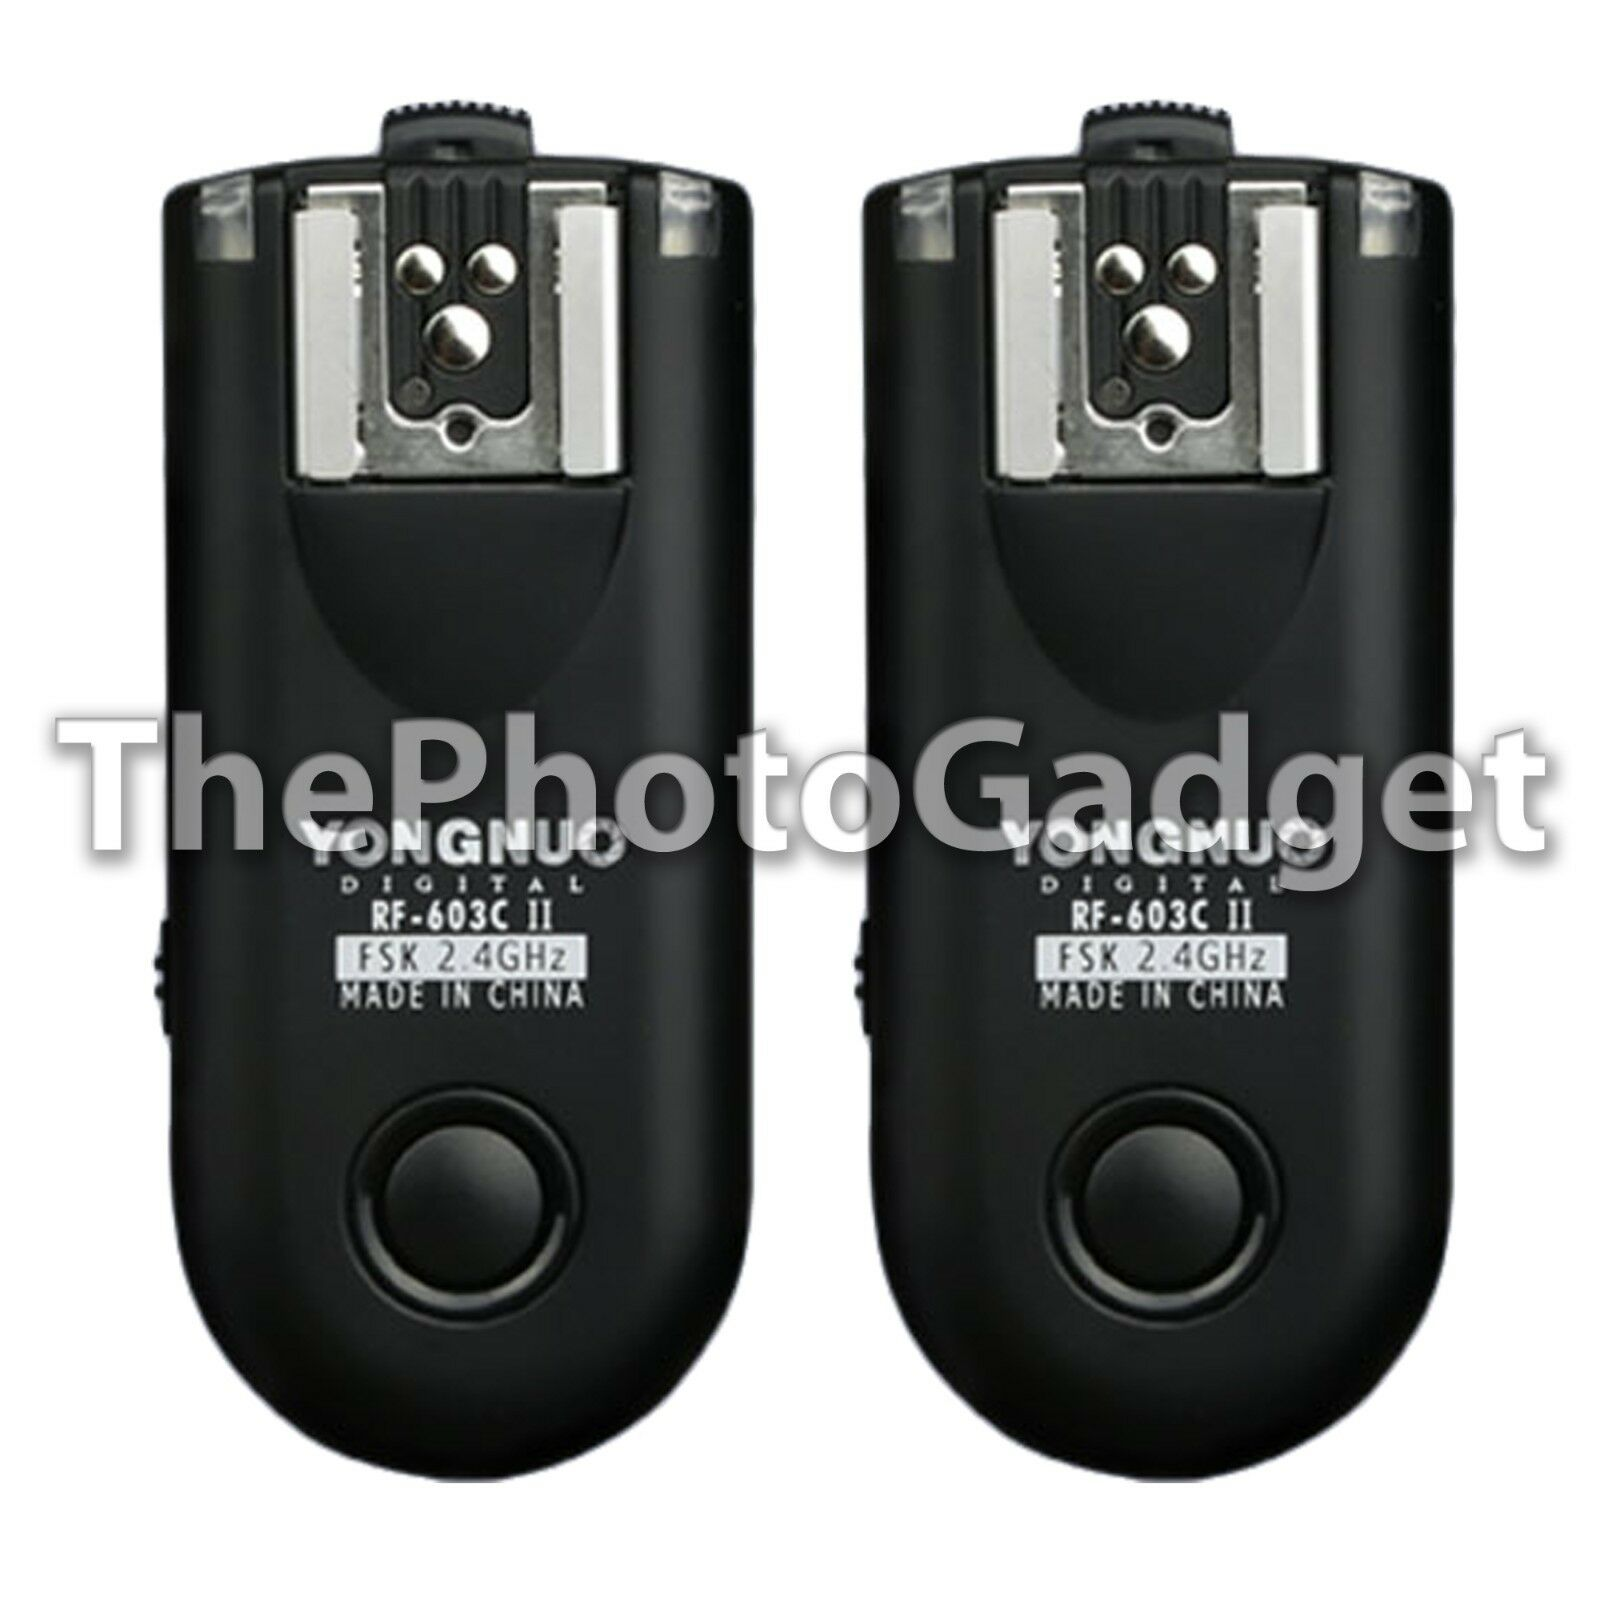 Yongnuo Rf-603 Ii 2.4ghz Radio Wireless Remote Flash Trigger N3 For Nikon Cam Us